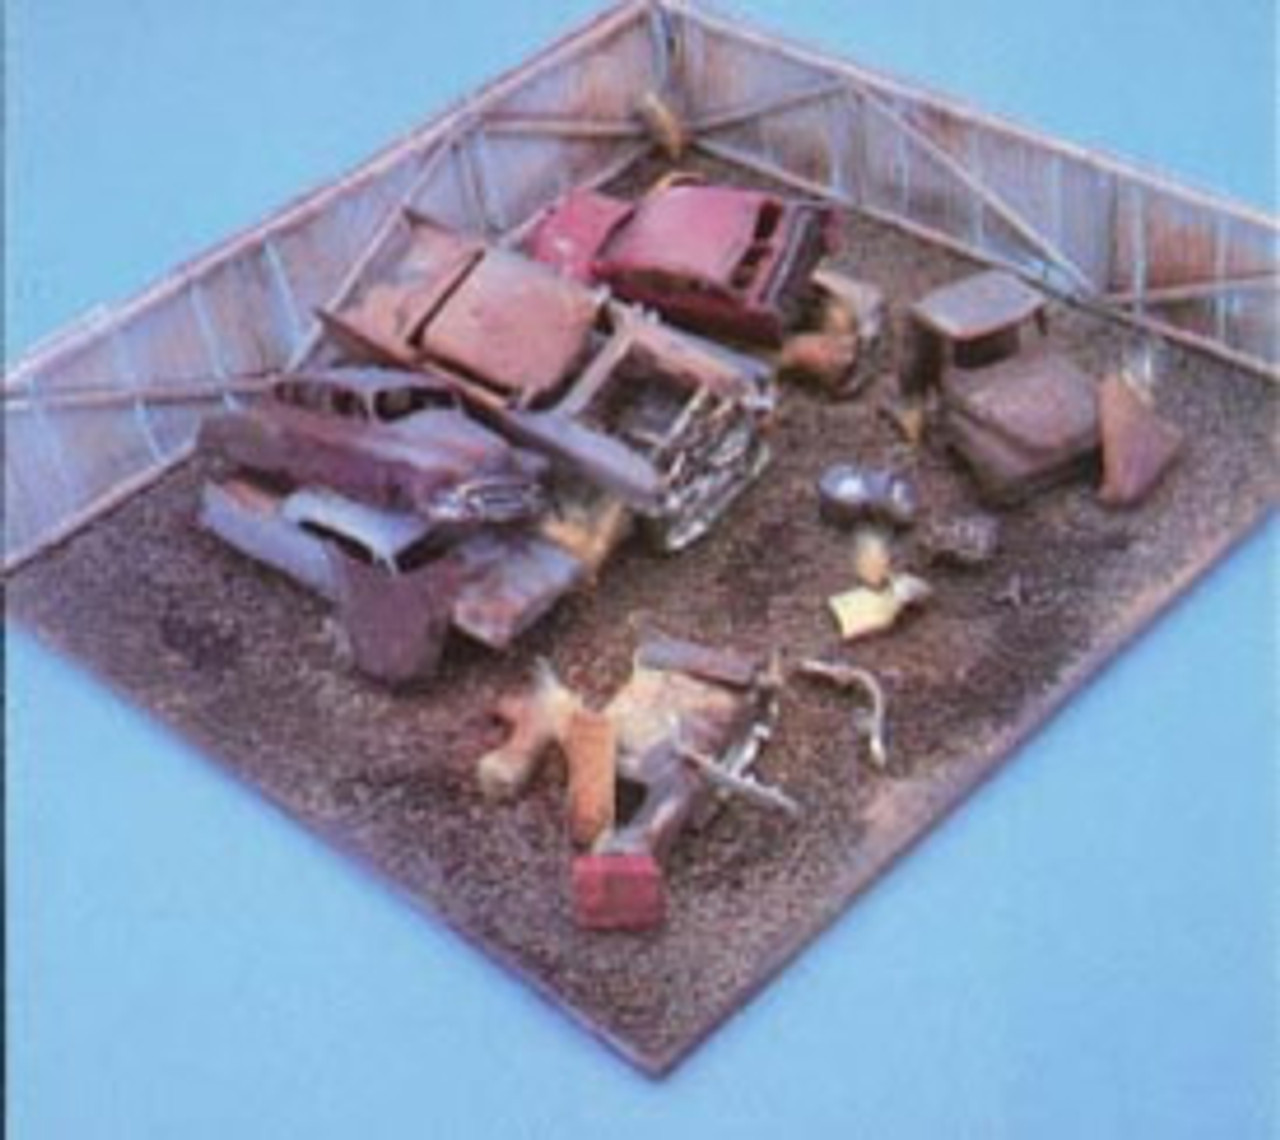 Junk Yard Autos or Truck Bodies / Parts